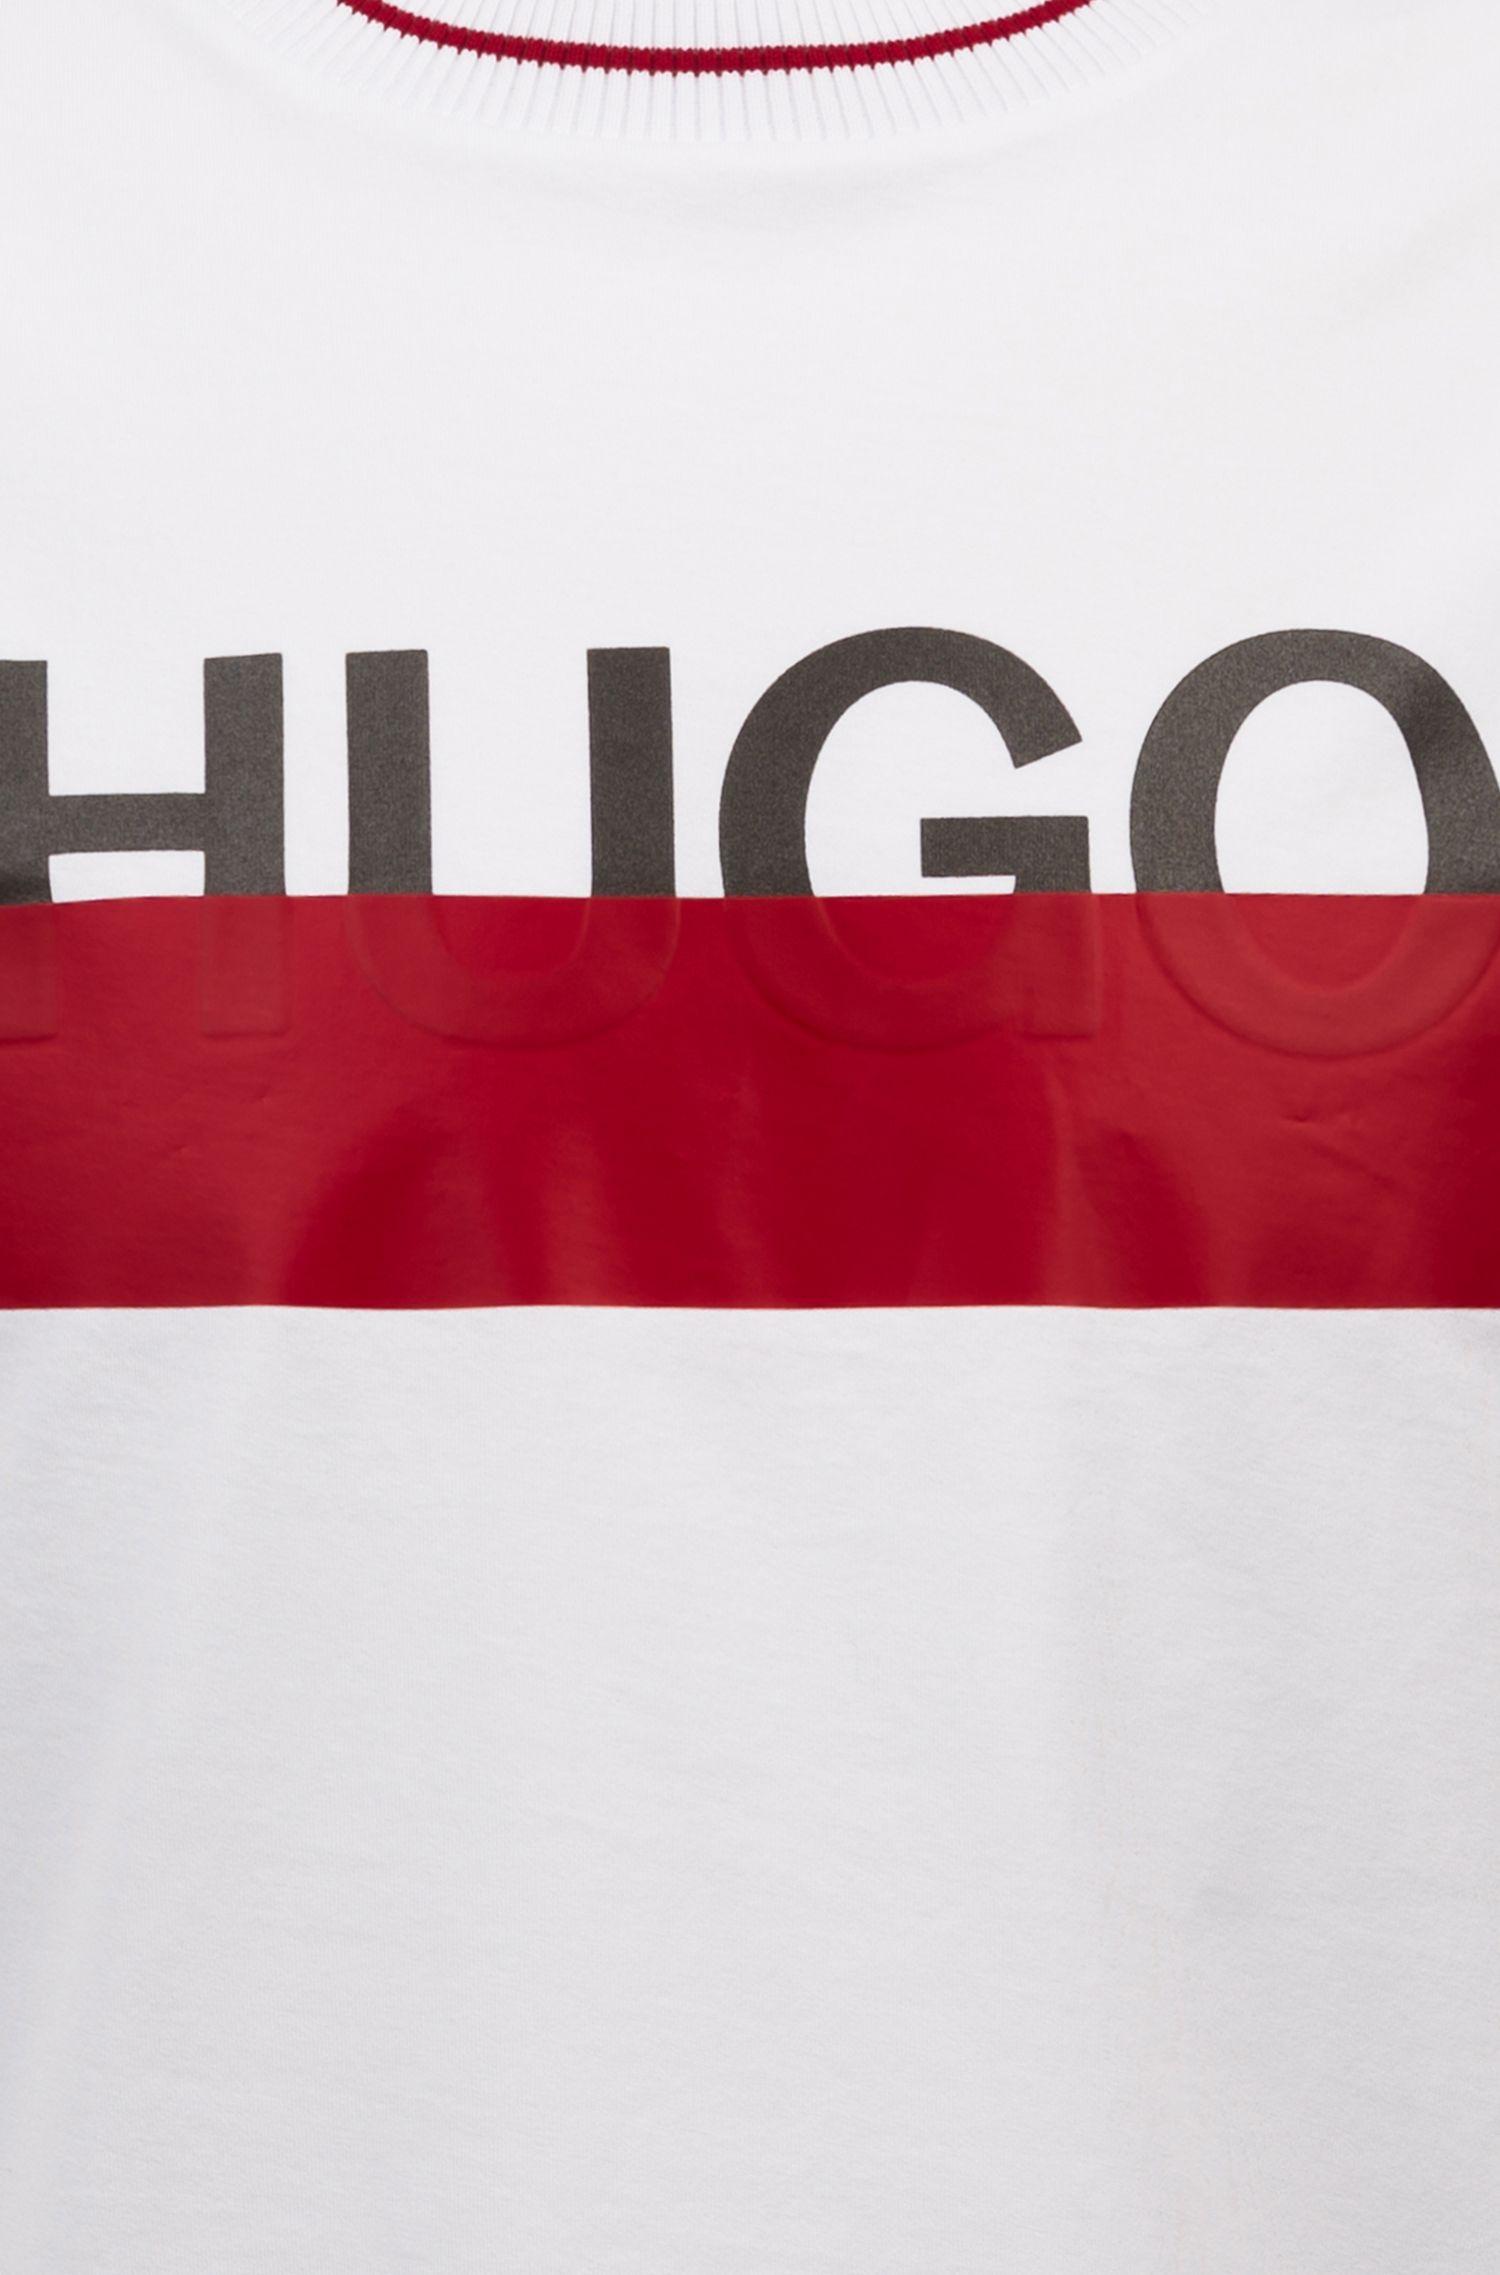 Hugo Boss - T-Shirt aus Baumwolle mit teilweise verdecktem Logo - 5